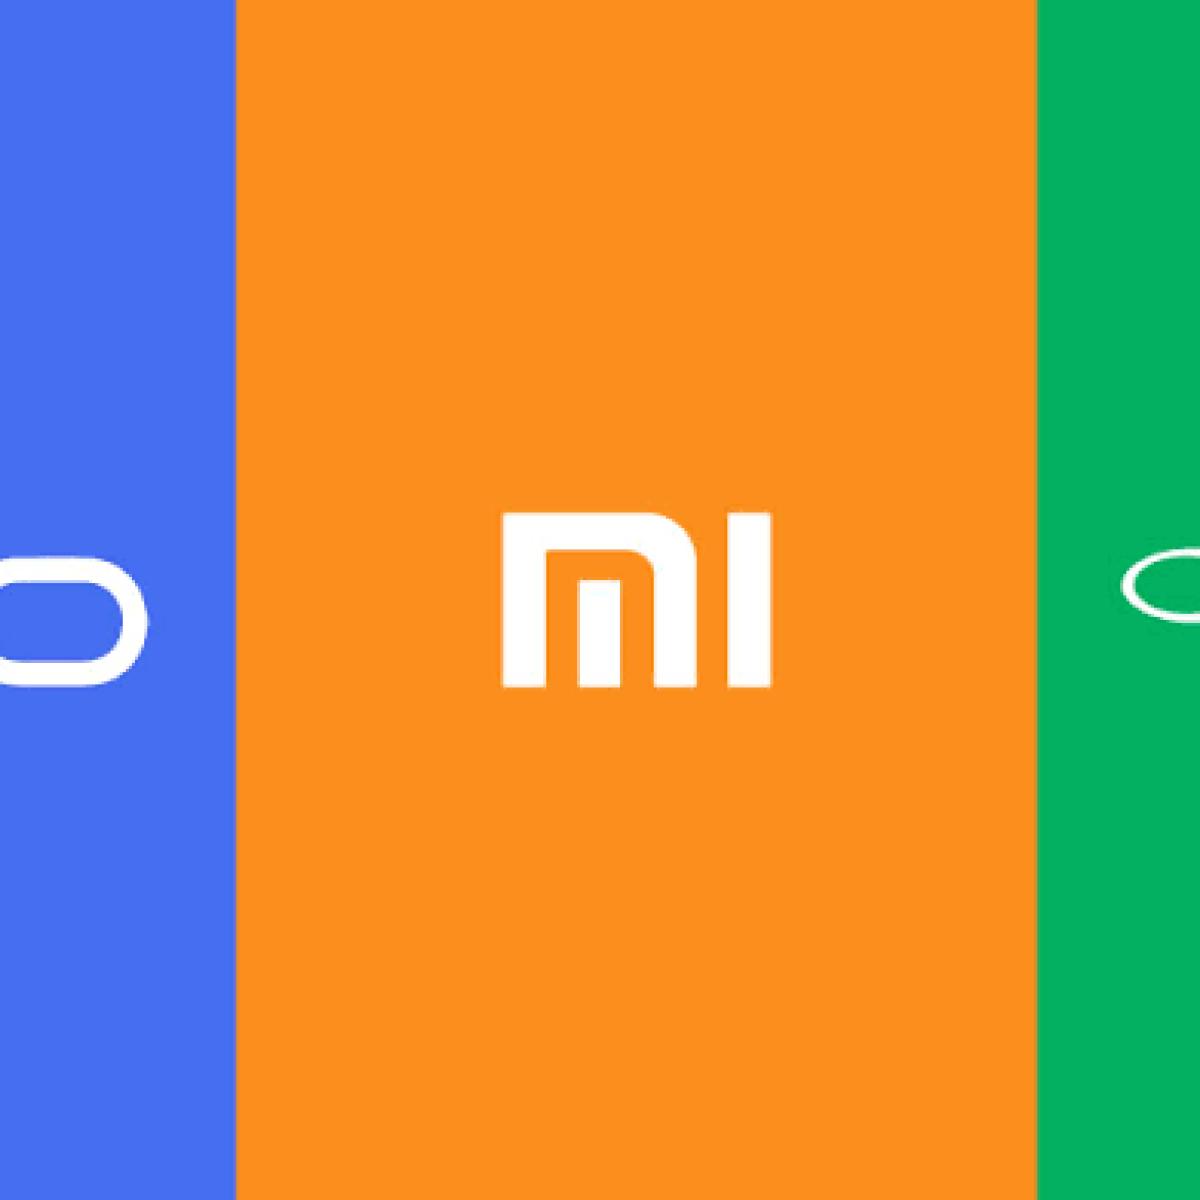 Oppo, Vivo join Xiaomi for wireless file transfer protocol